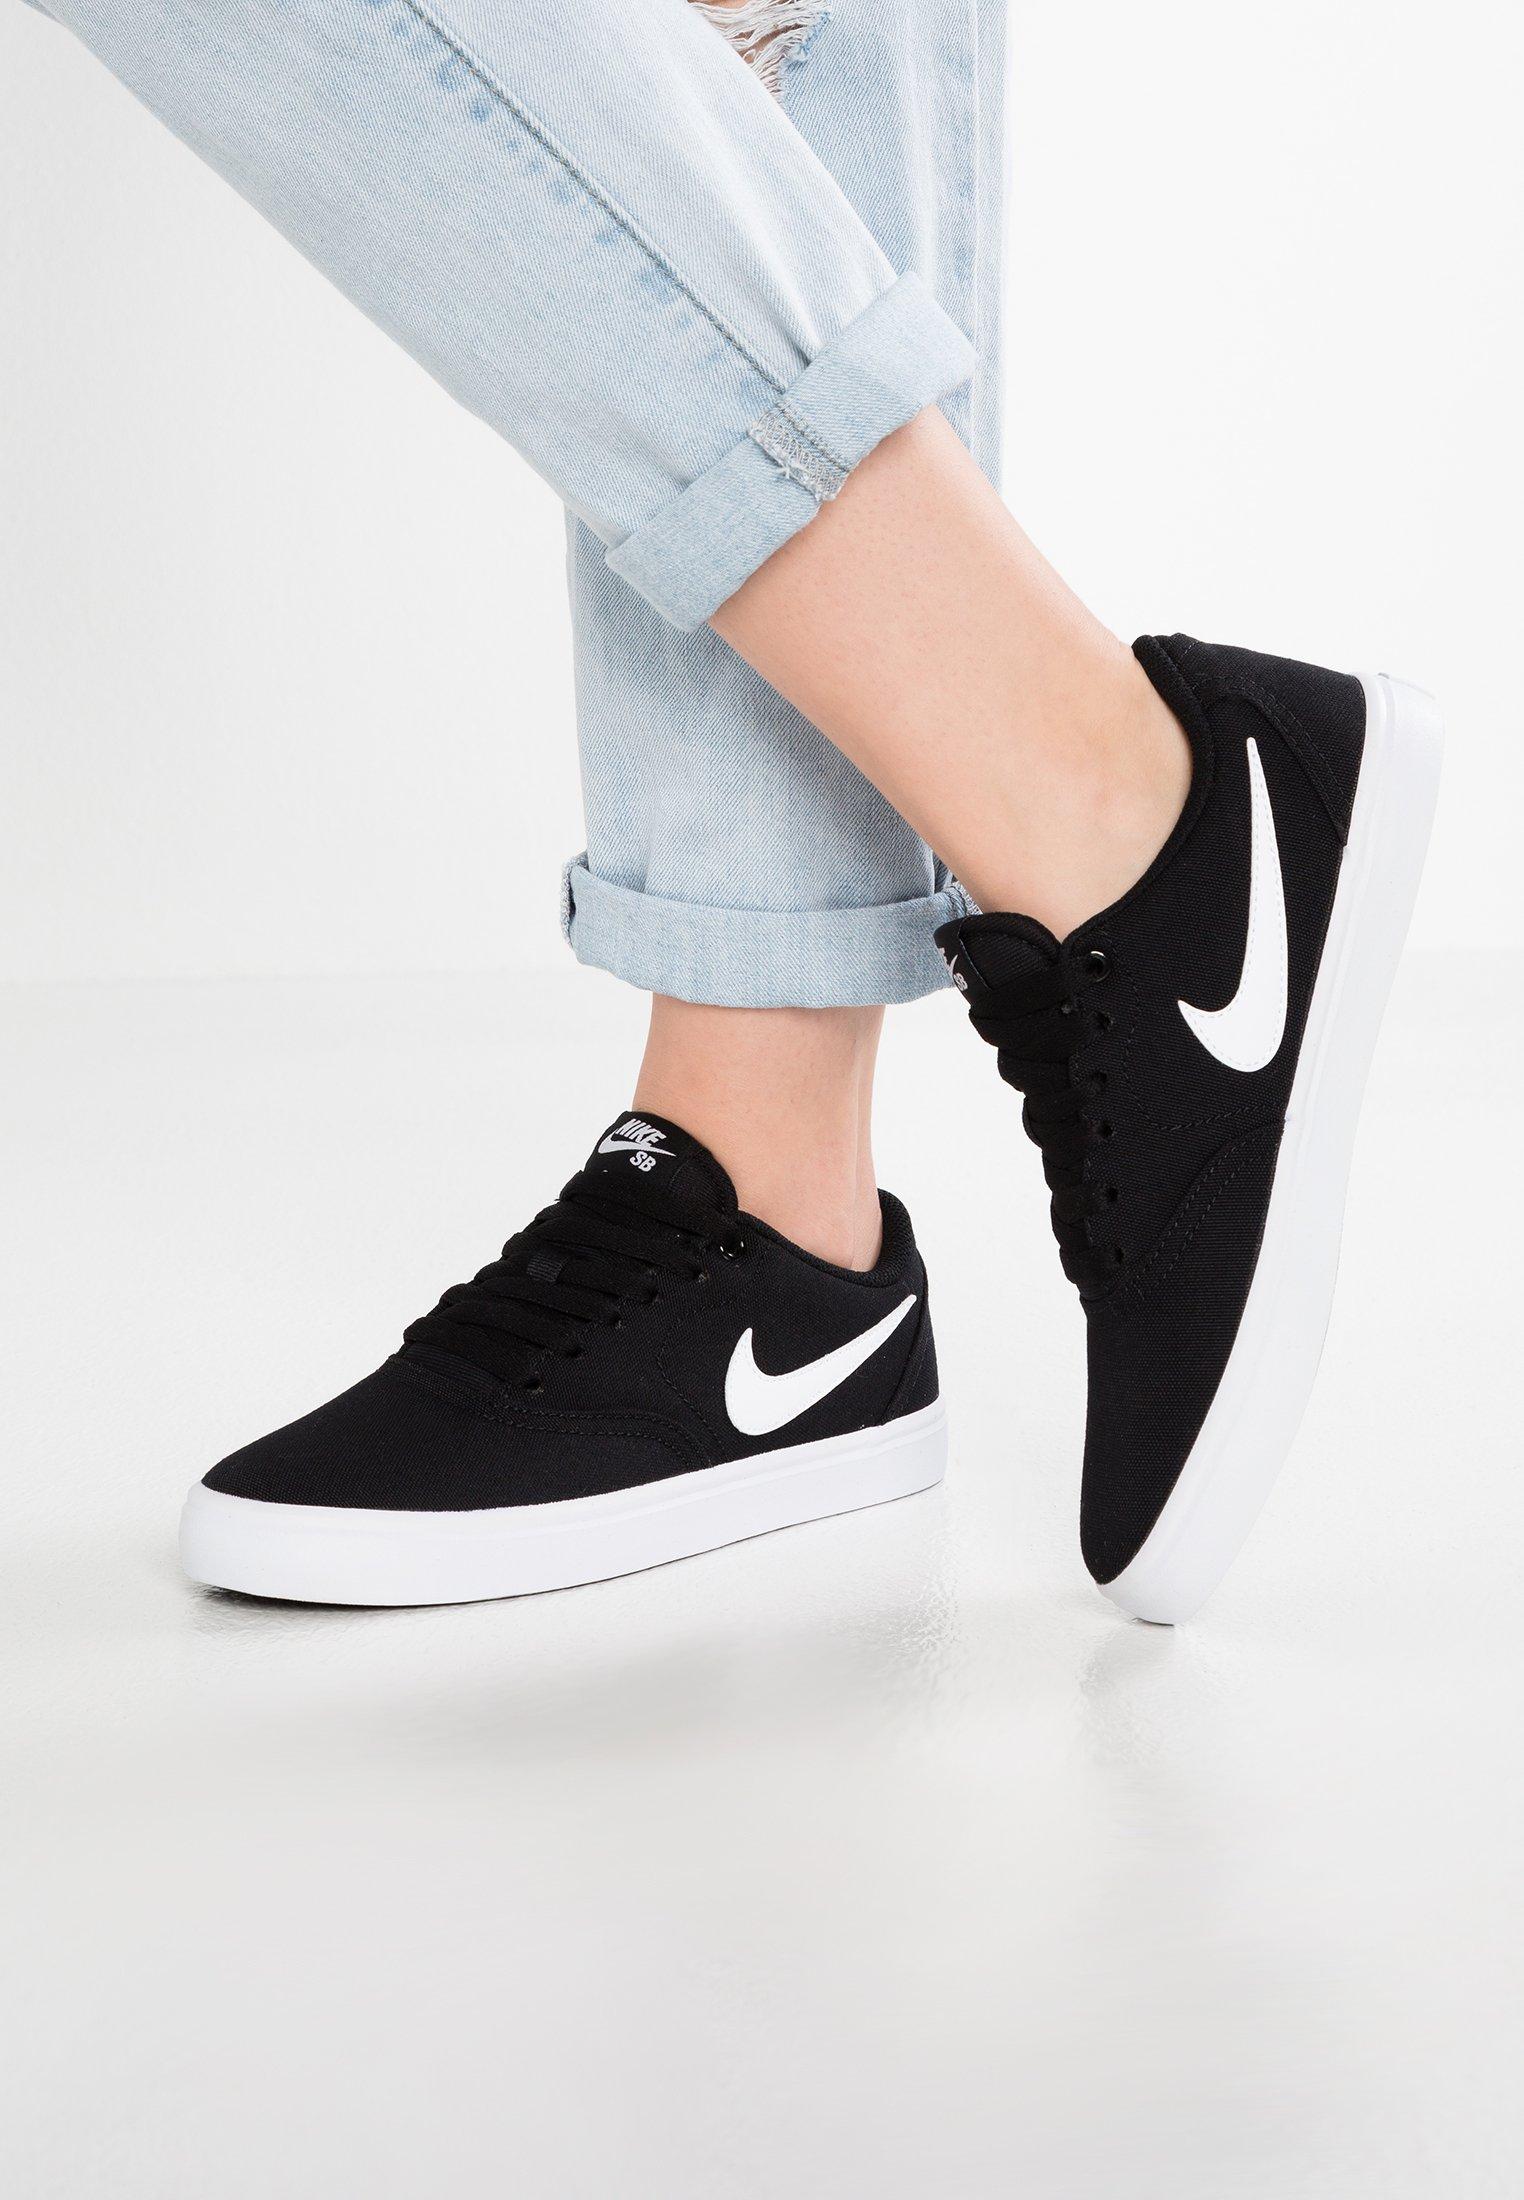 CHECK SOLAR Sneakers blackwhitepure platinum